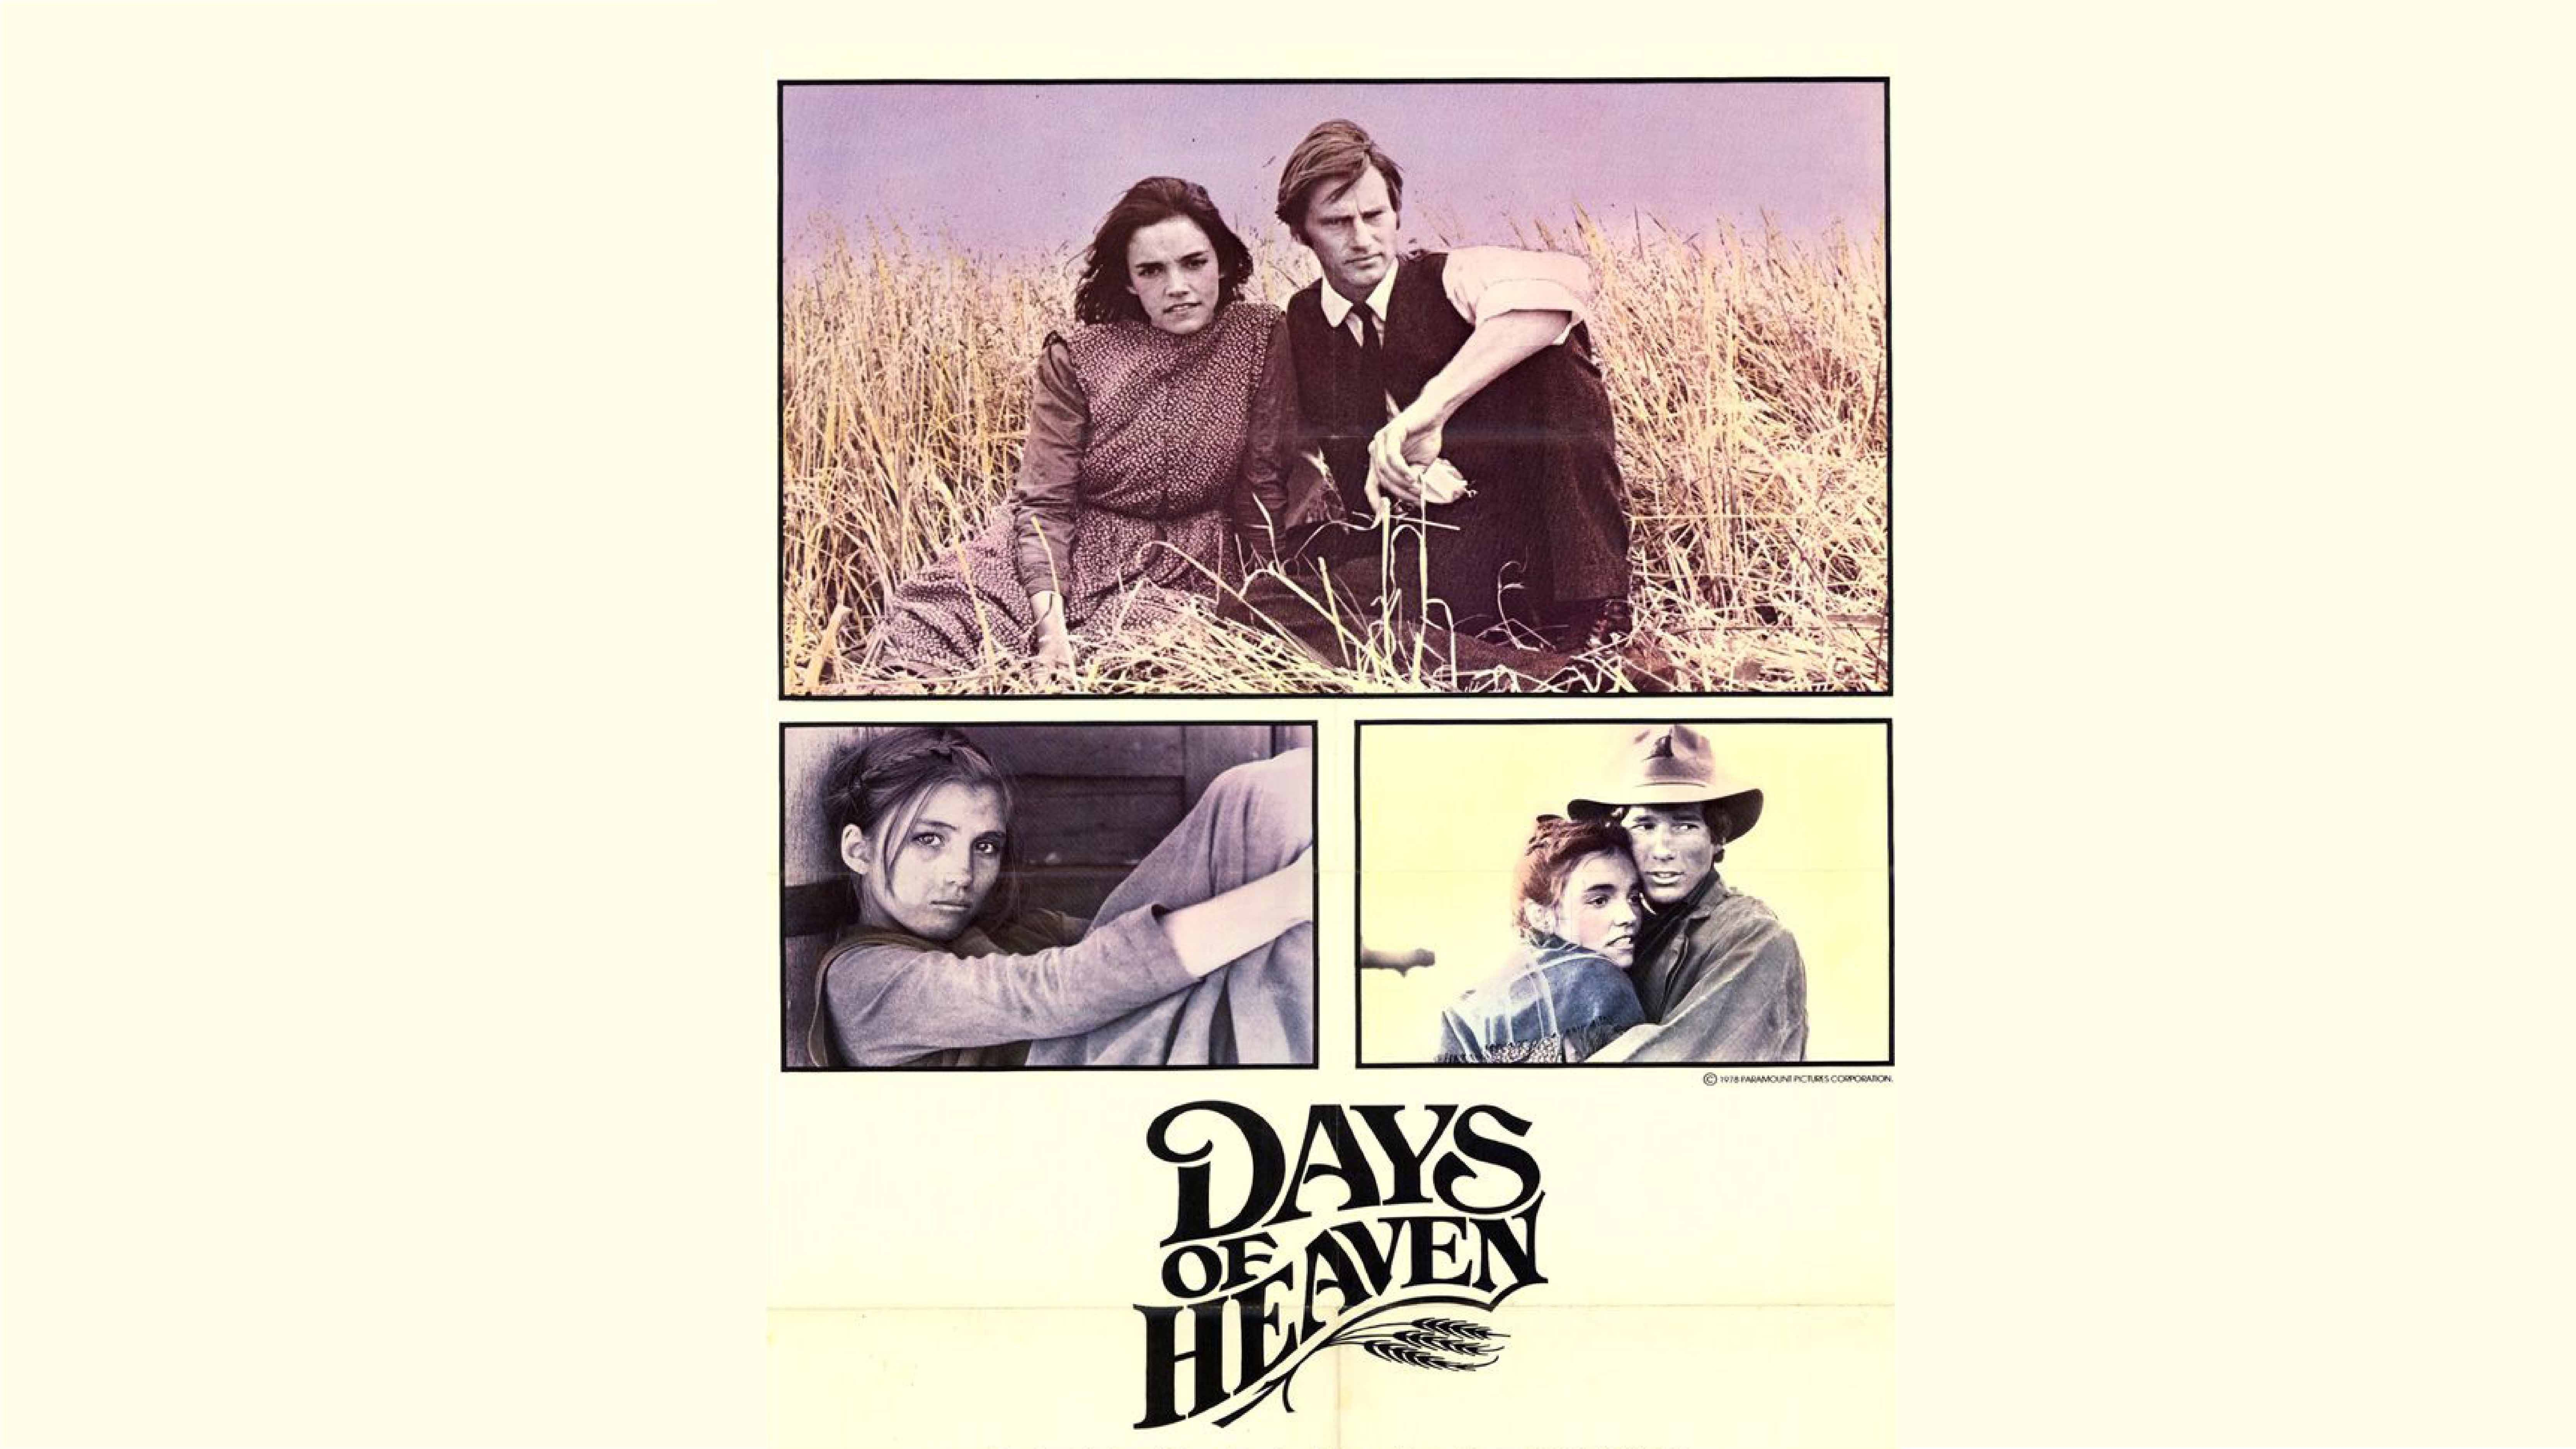 Days Of Heaven – Screening